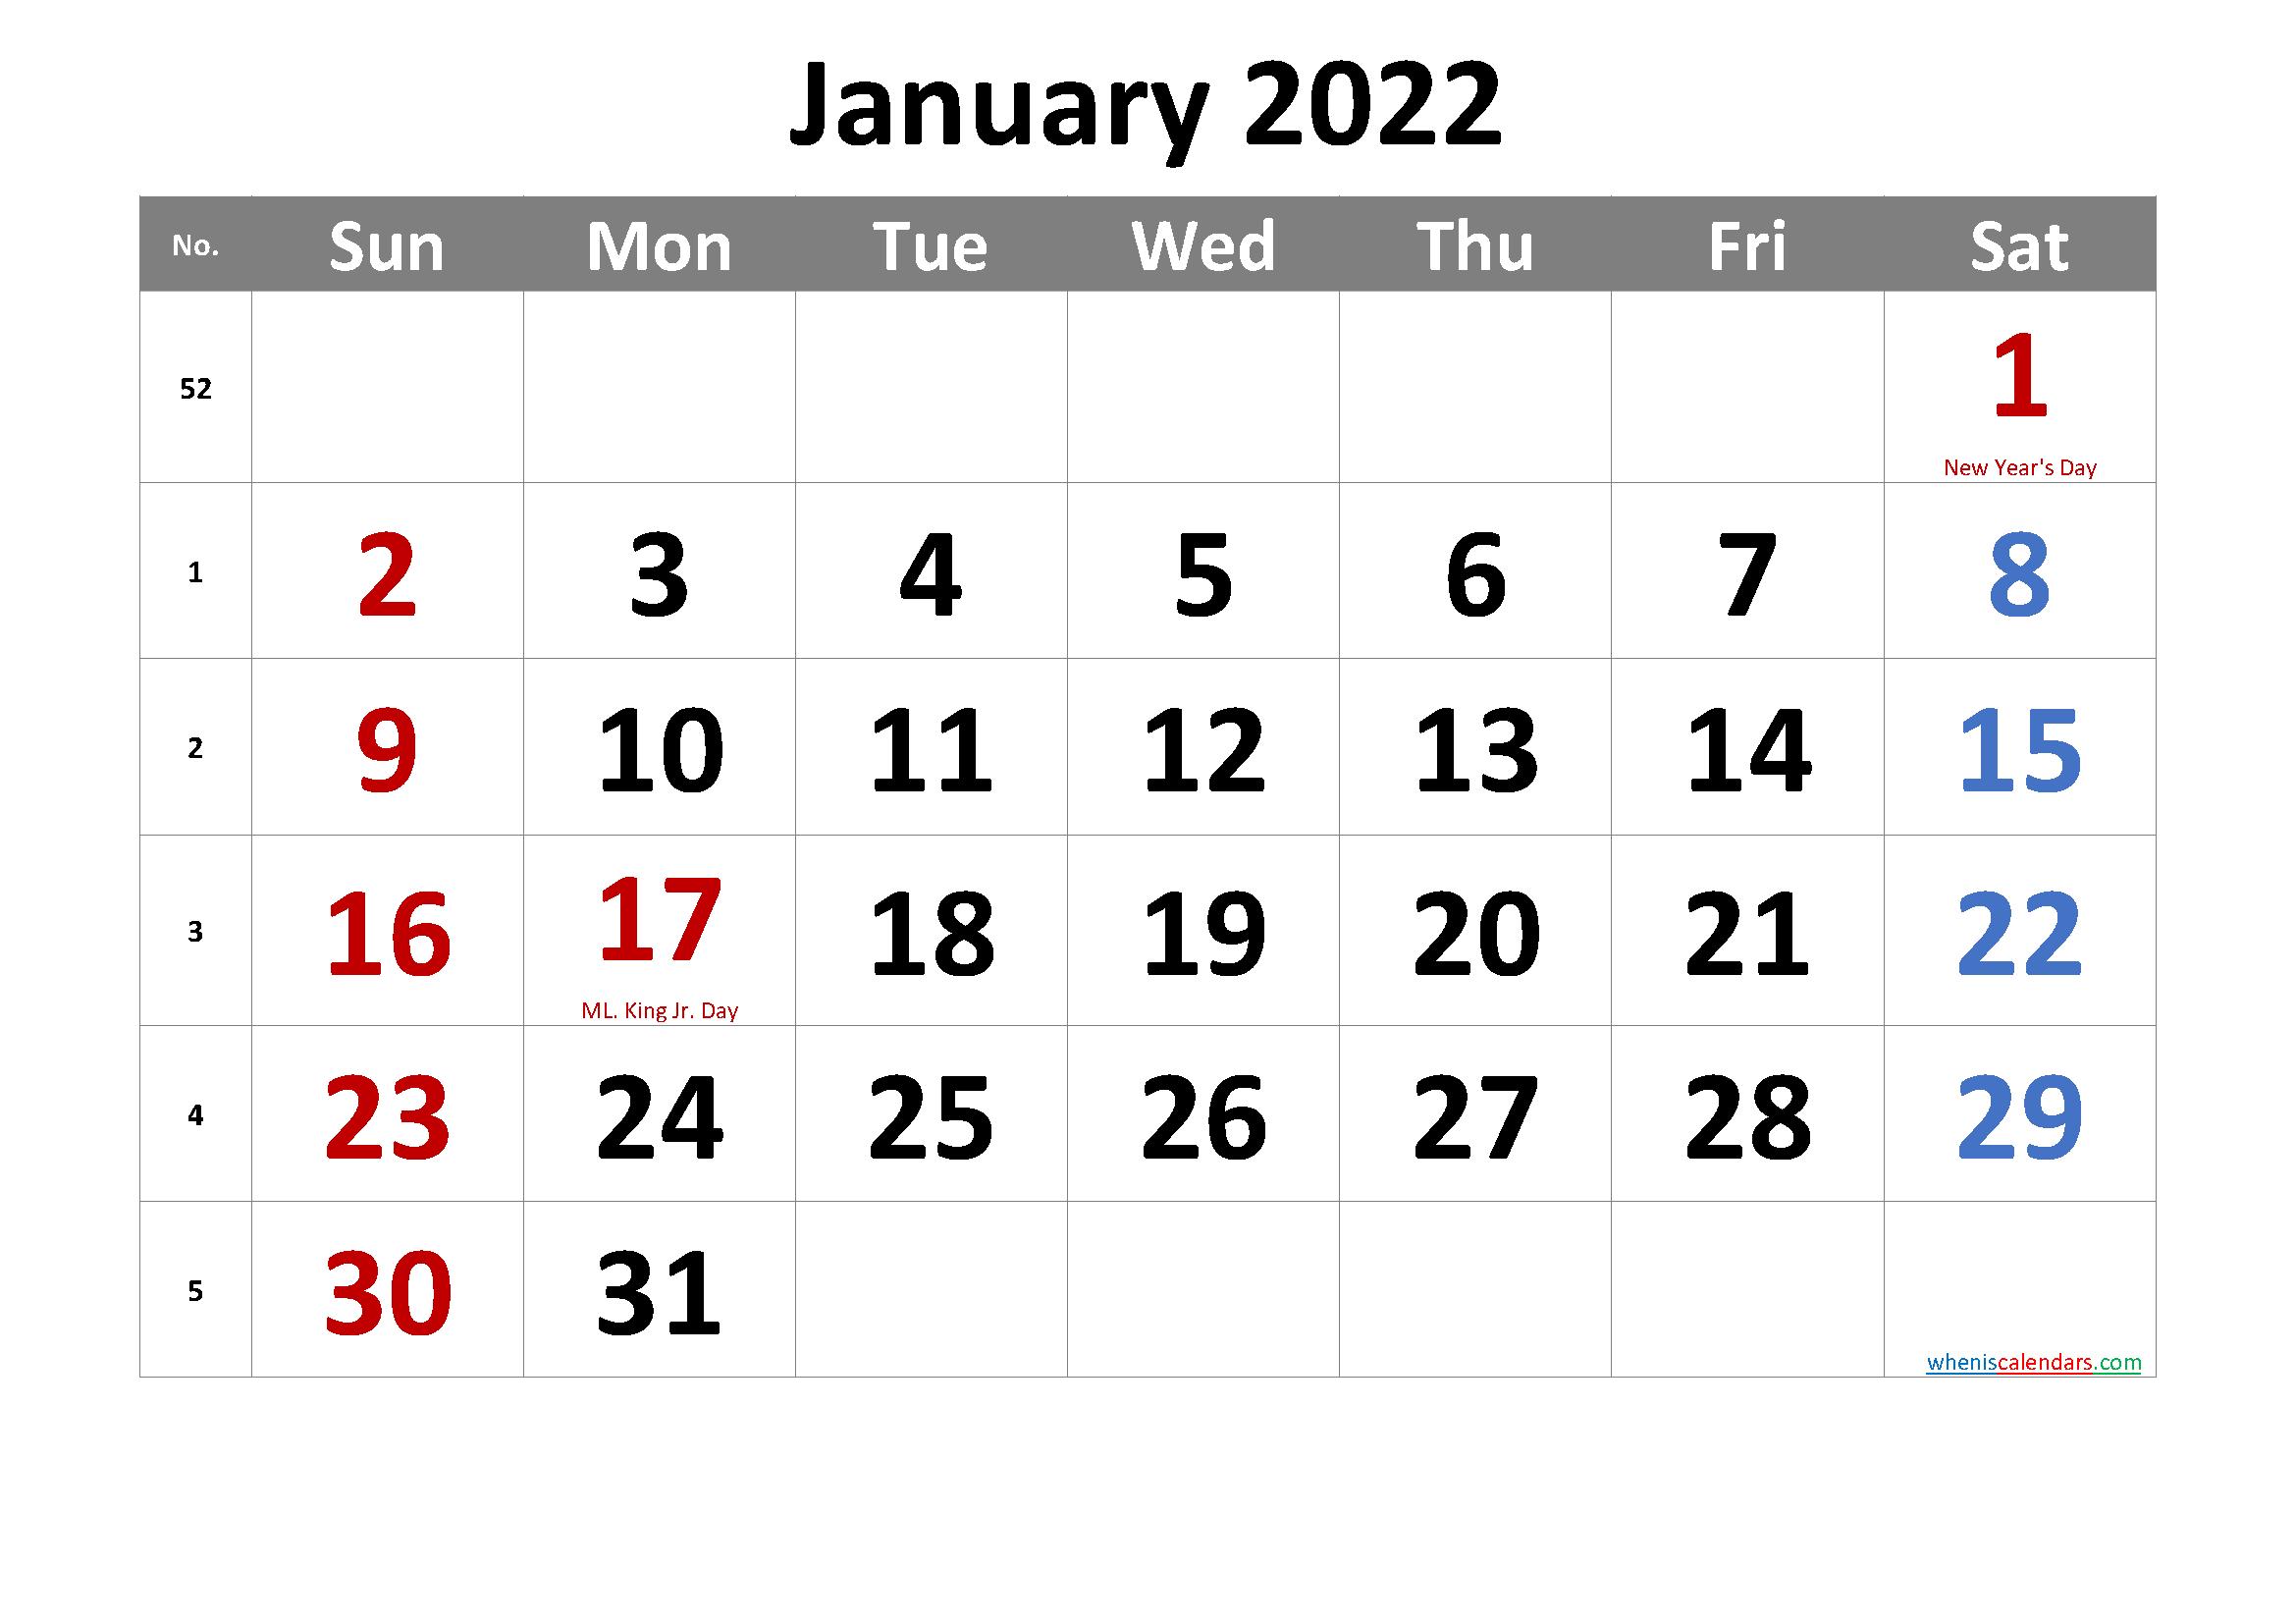 Free January 2022 Calendar Printable Intended For Calendar 2022 January Printable